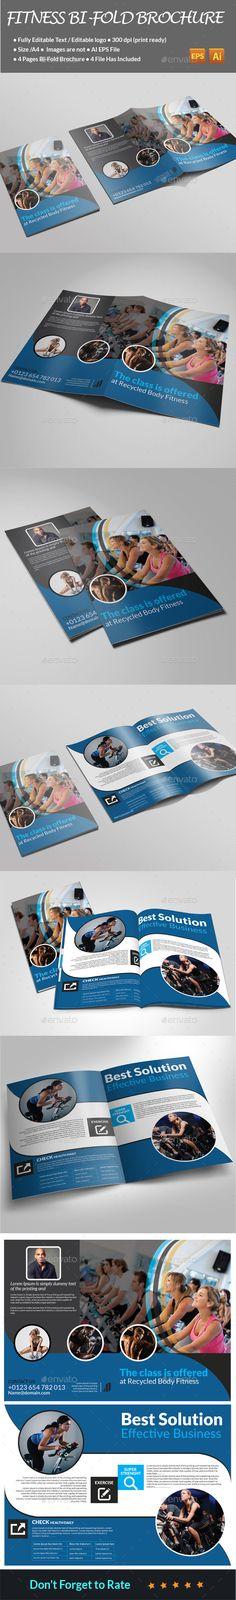 Fitness Bi-Fold Brochure VEctor EPS, AI Template #design Download: http://graphicriver.net/item/fitness-bifold-brochure-/13906442?ref=ksioks